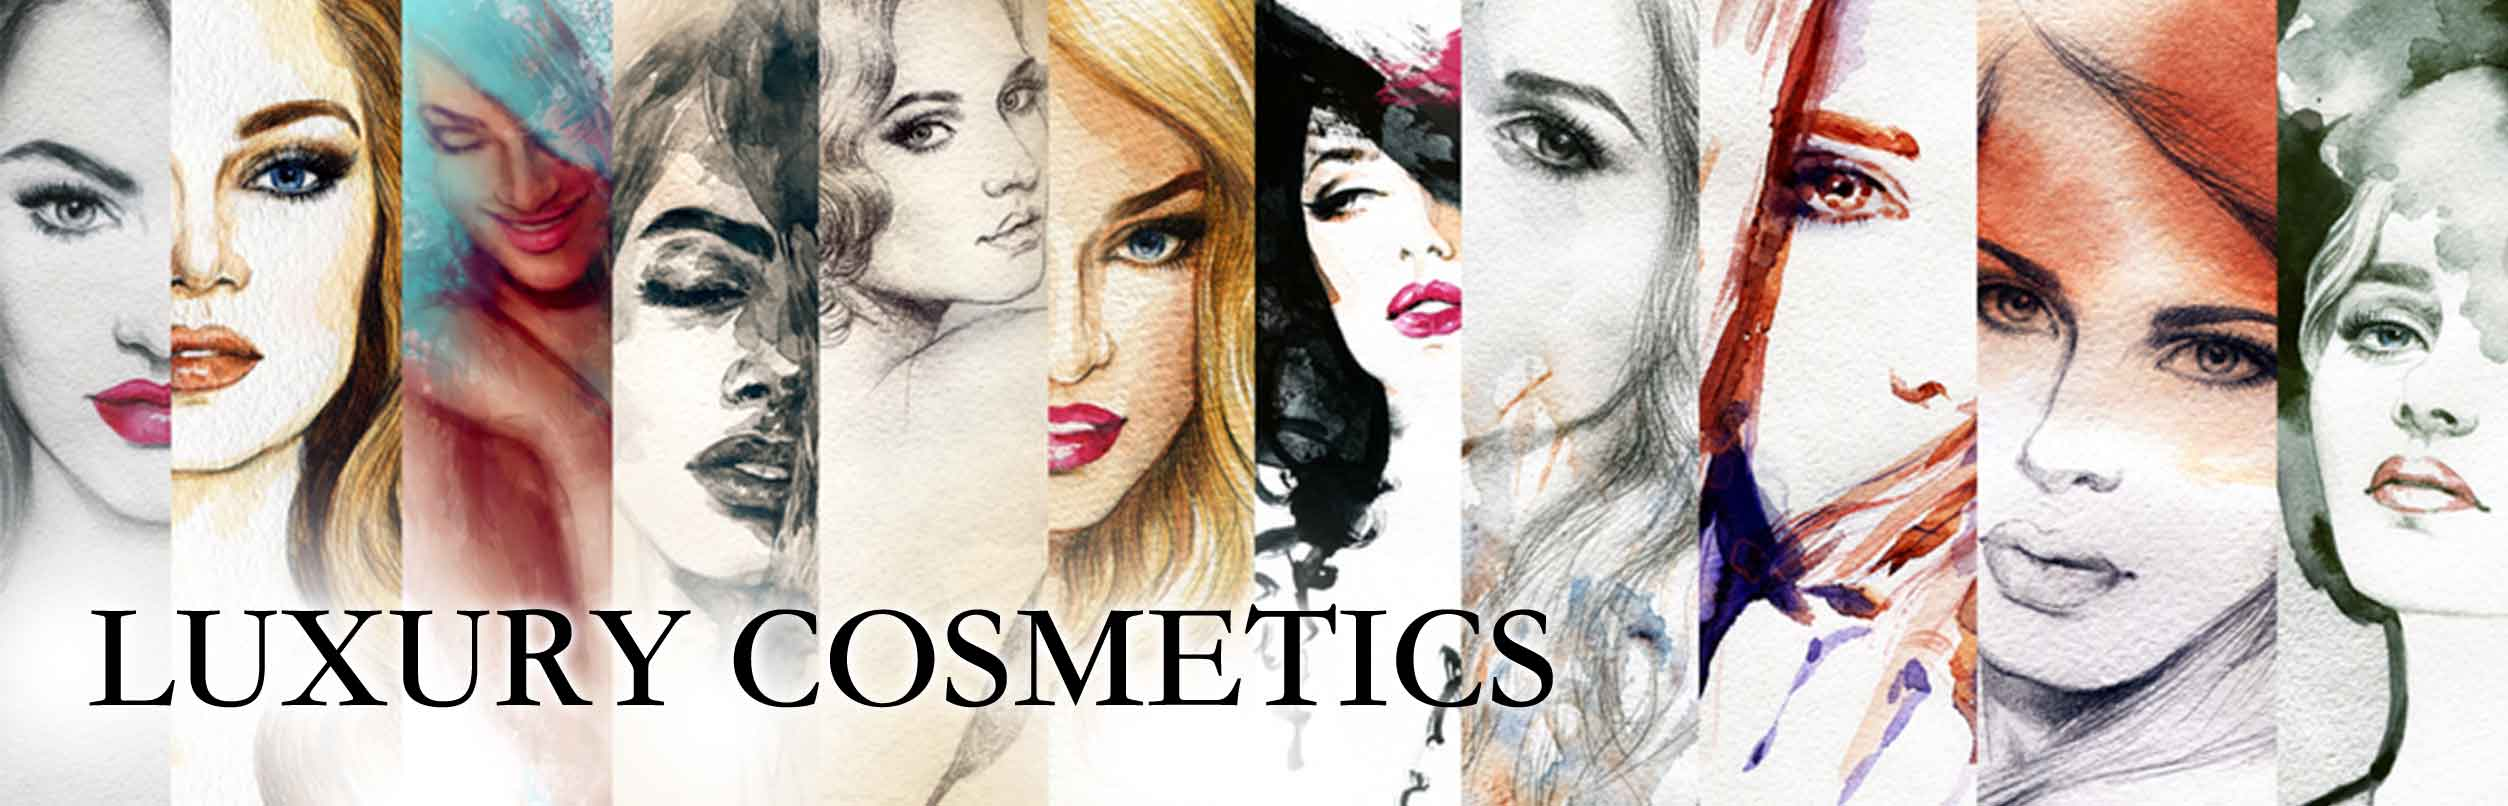 cosmetics_banner_resize